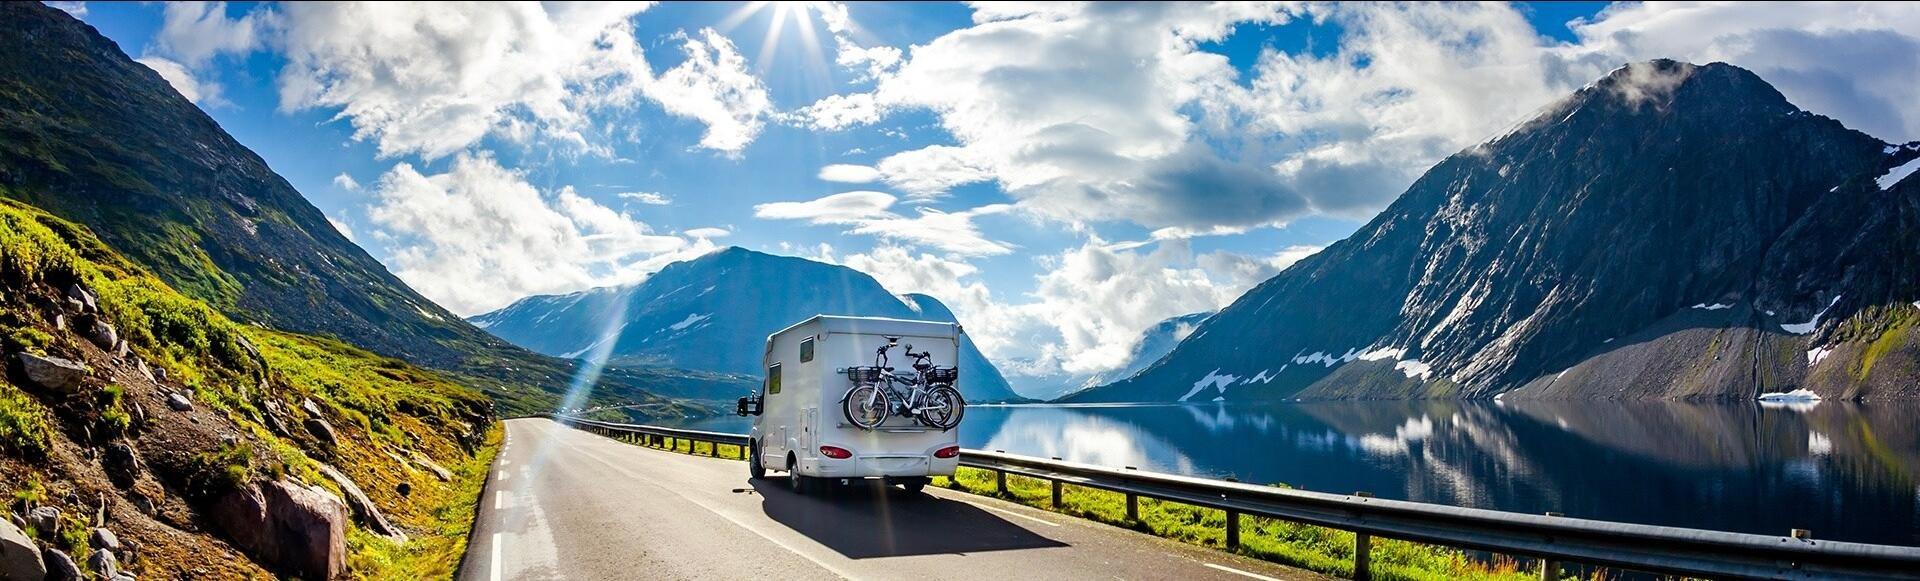 Wohnmobilreisen  Campingreisen